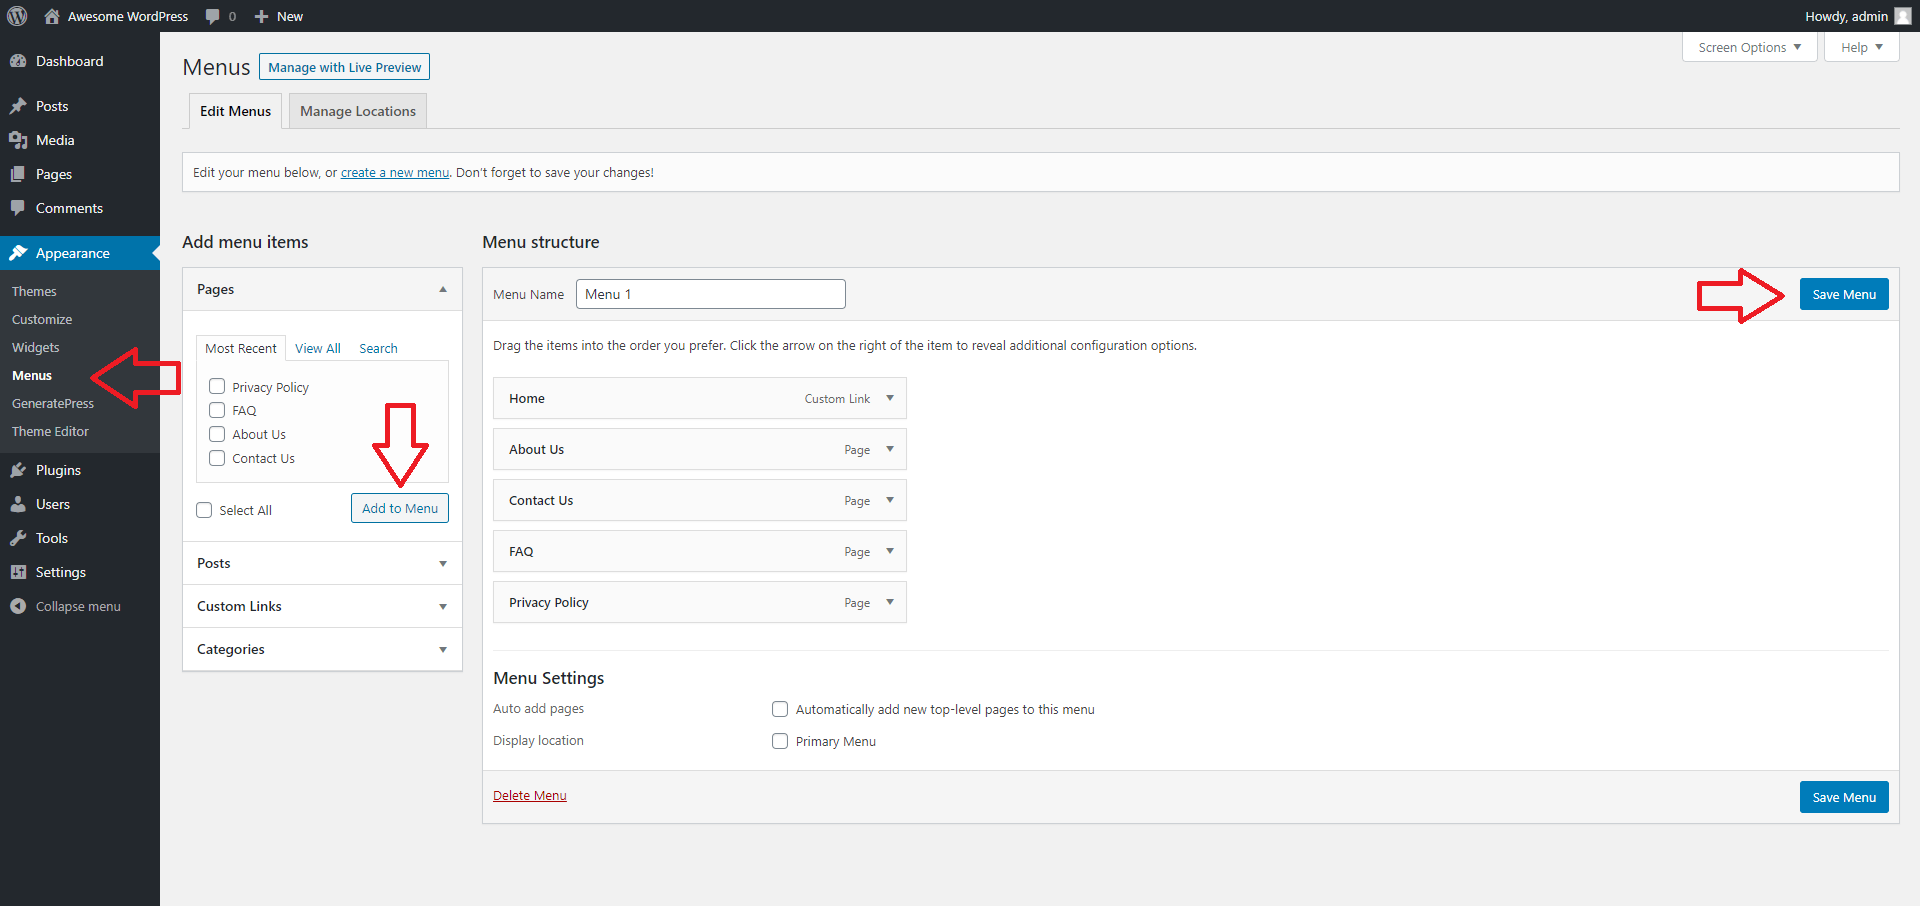 How to Use the WordPress Dashboard - Creating a WordPress Menu